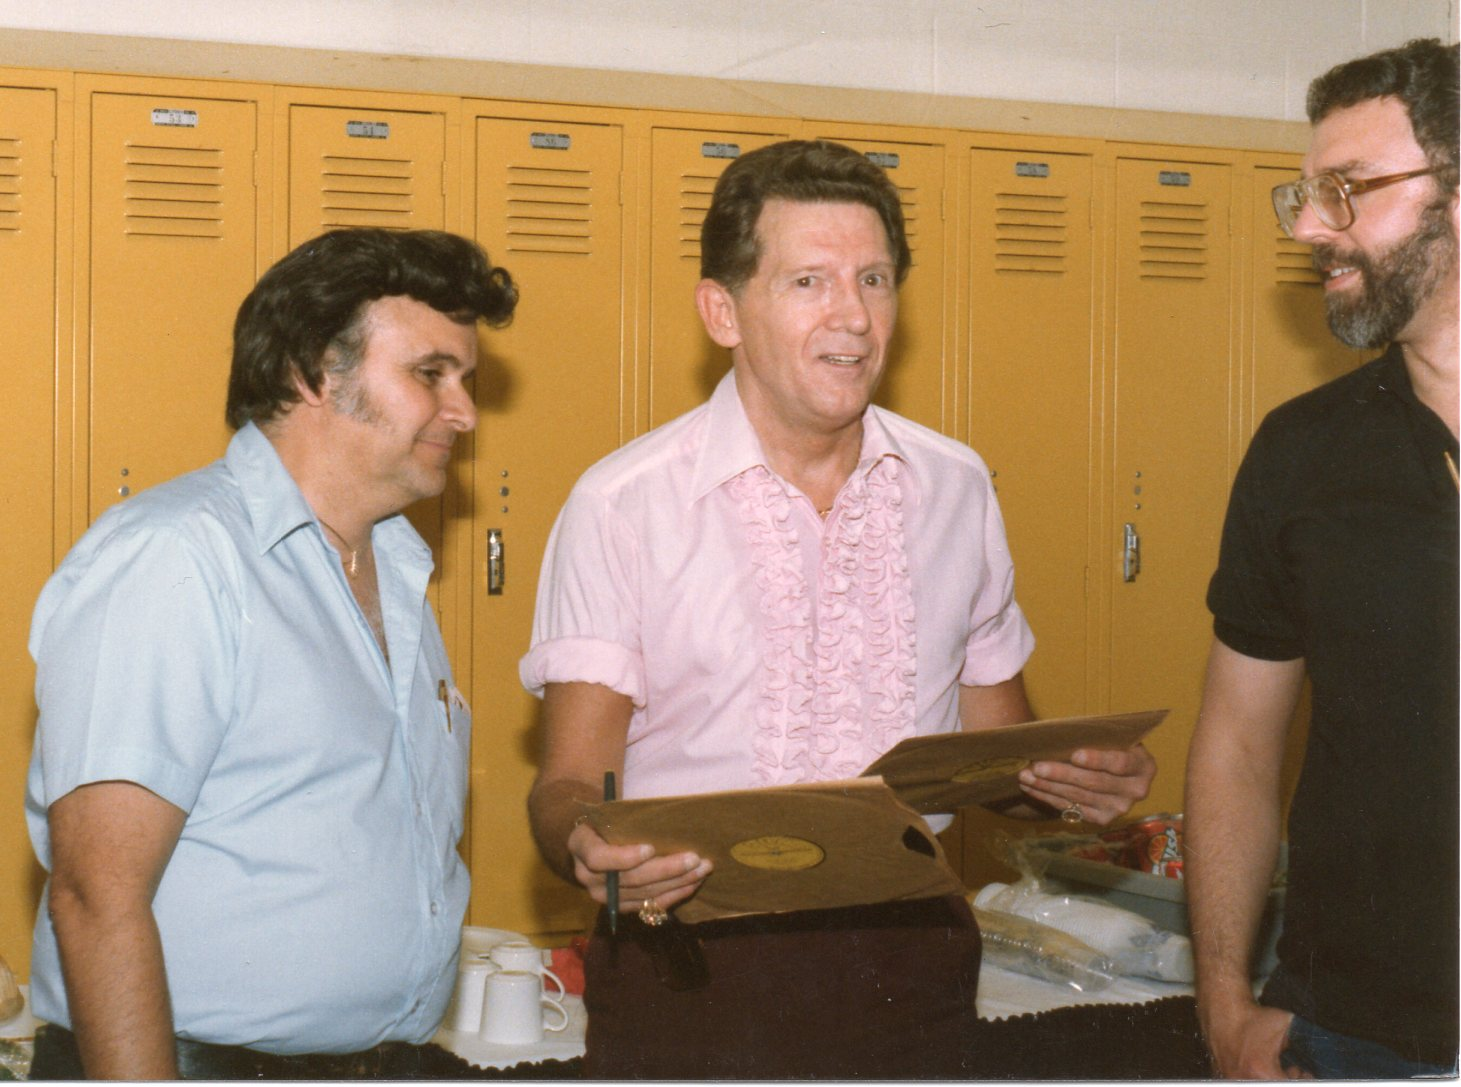 Jerry Lee Lewis & Gary Skala